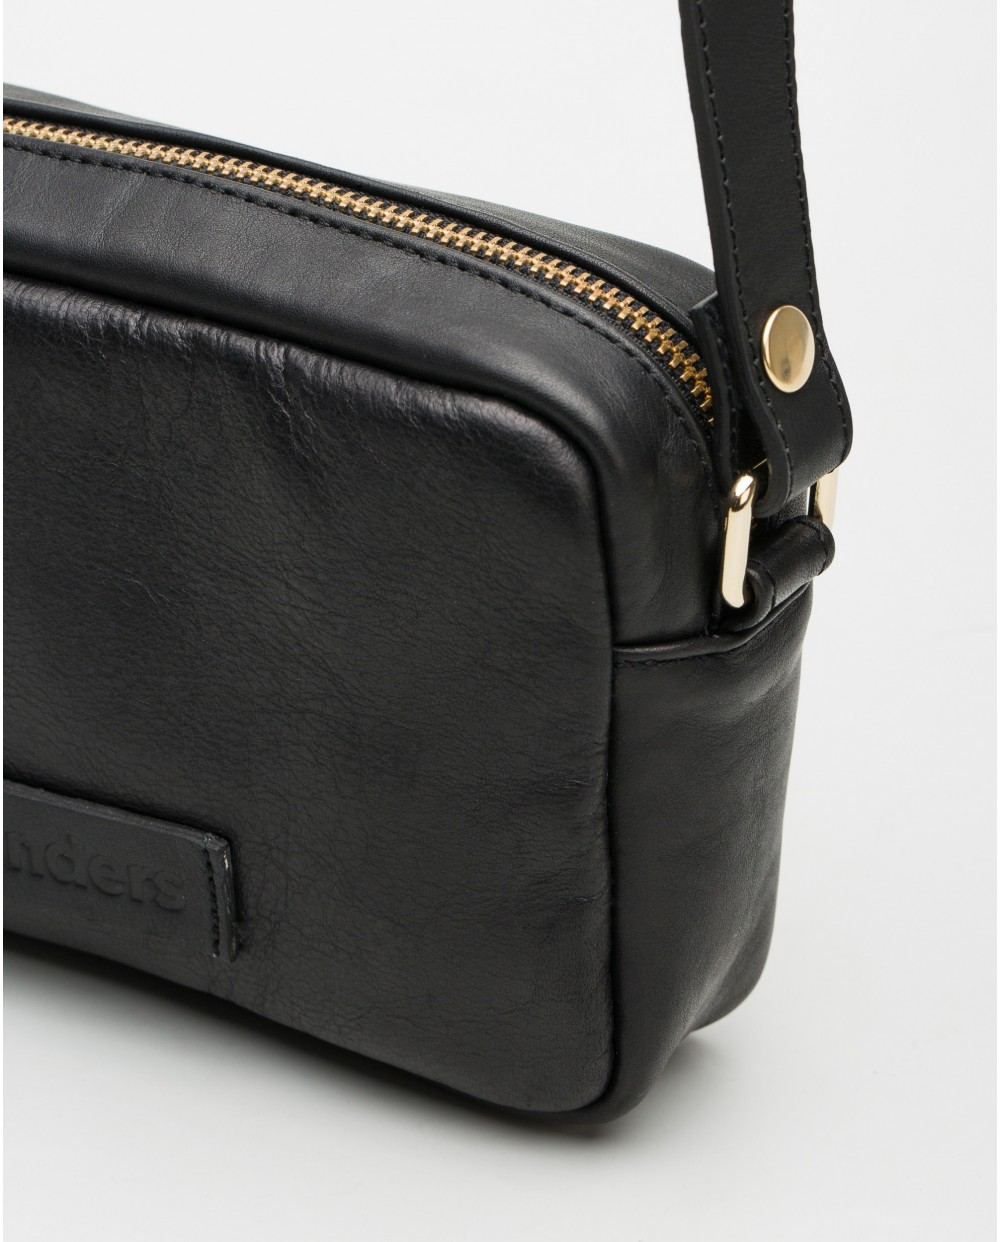 Wonders-Bags-White leather Bum bag